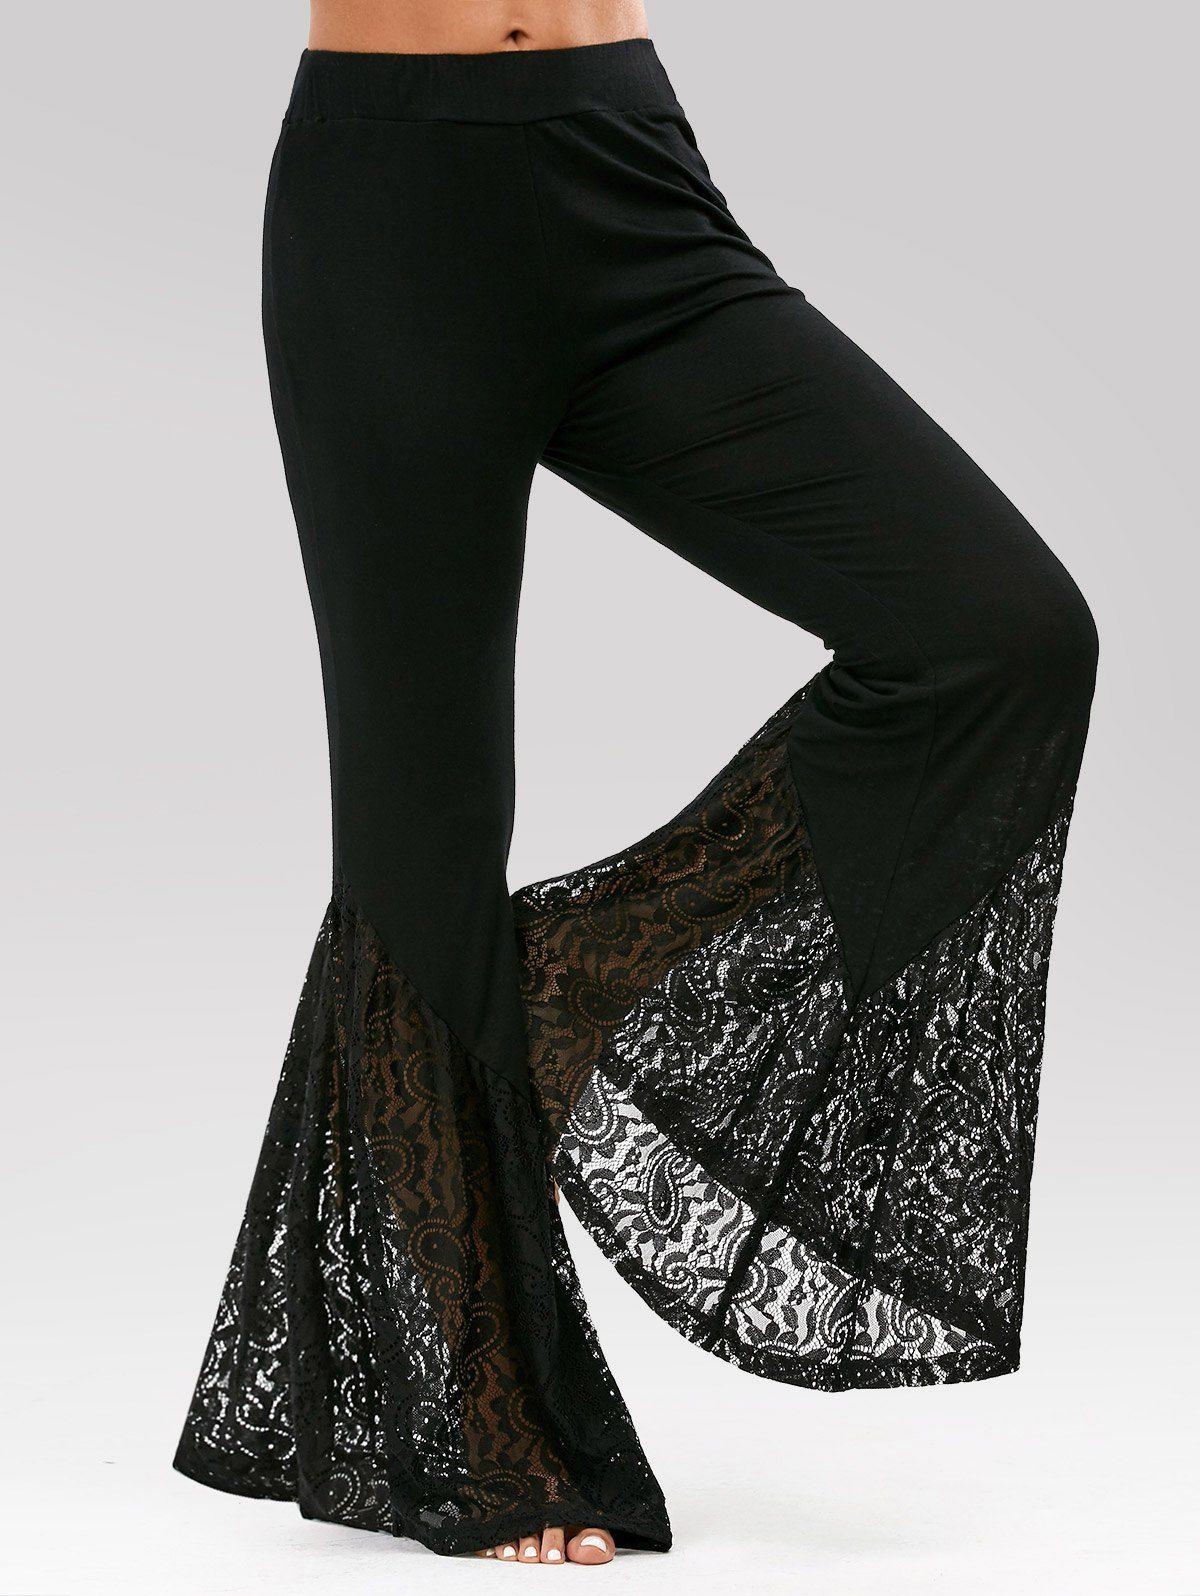 93b1fbea87 High Waisted Lace Insert Bell Bottom Pants - BLACK 2XL | diy ideas ...